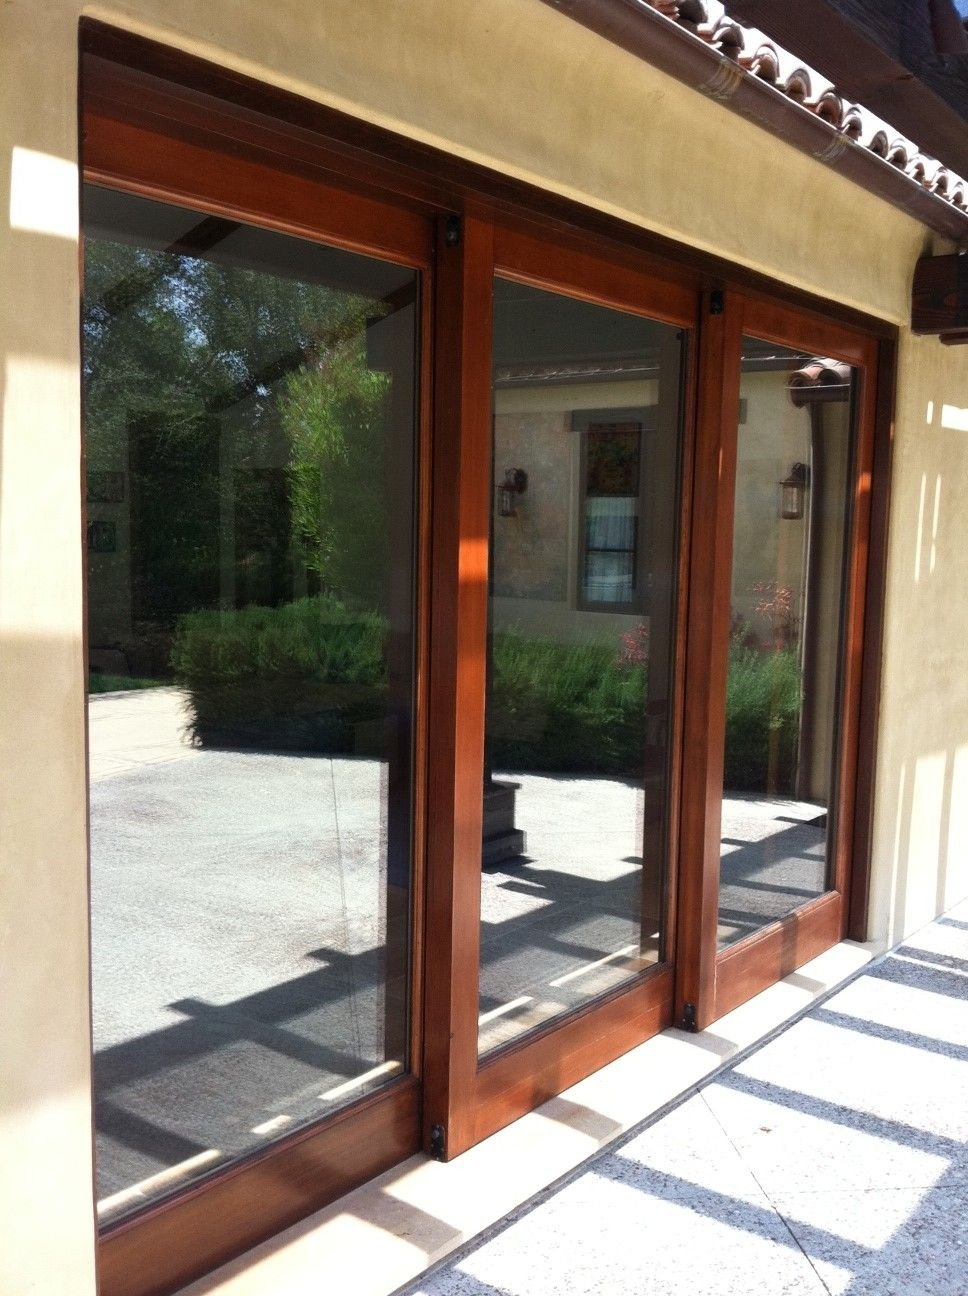 Pocket Sliding Glass Patio Doors Con Immagini Nuove Case Case